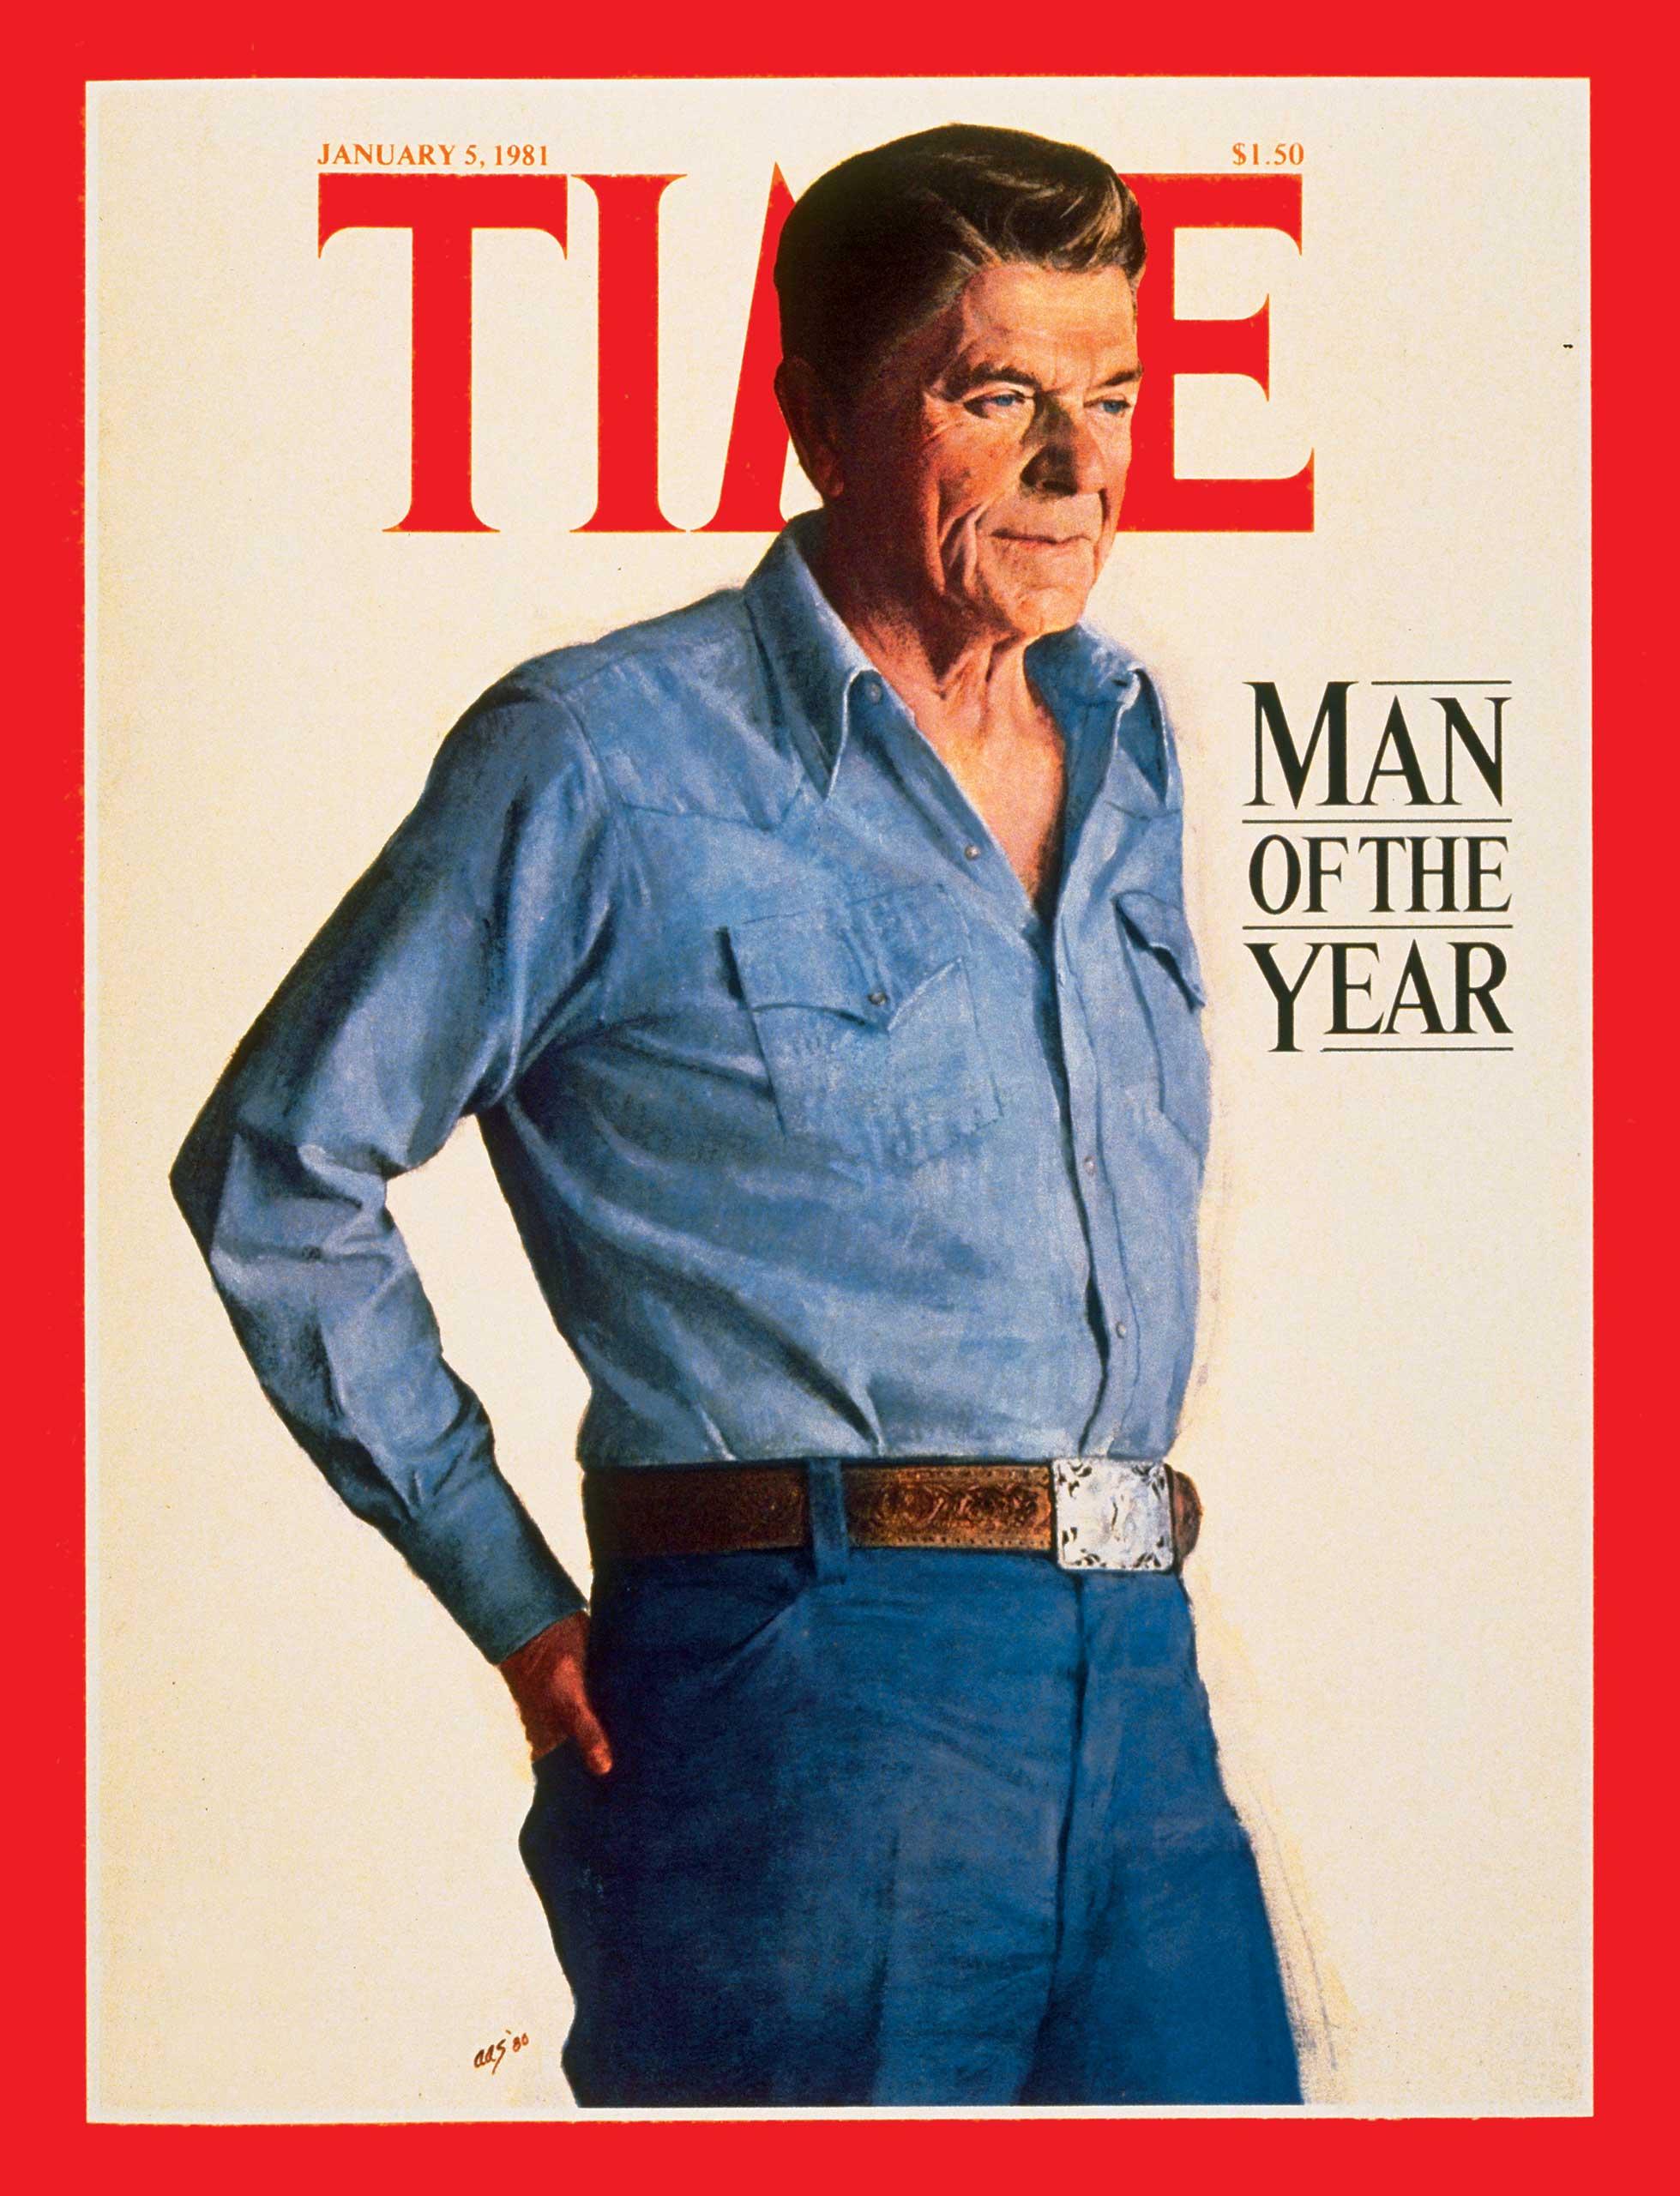 1980: President Ronald Reagan